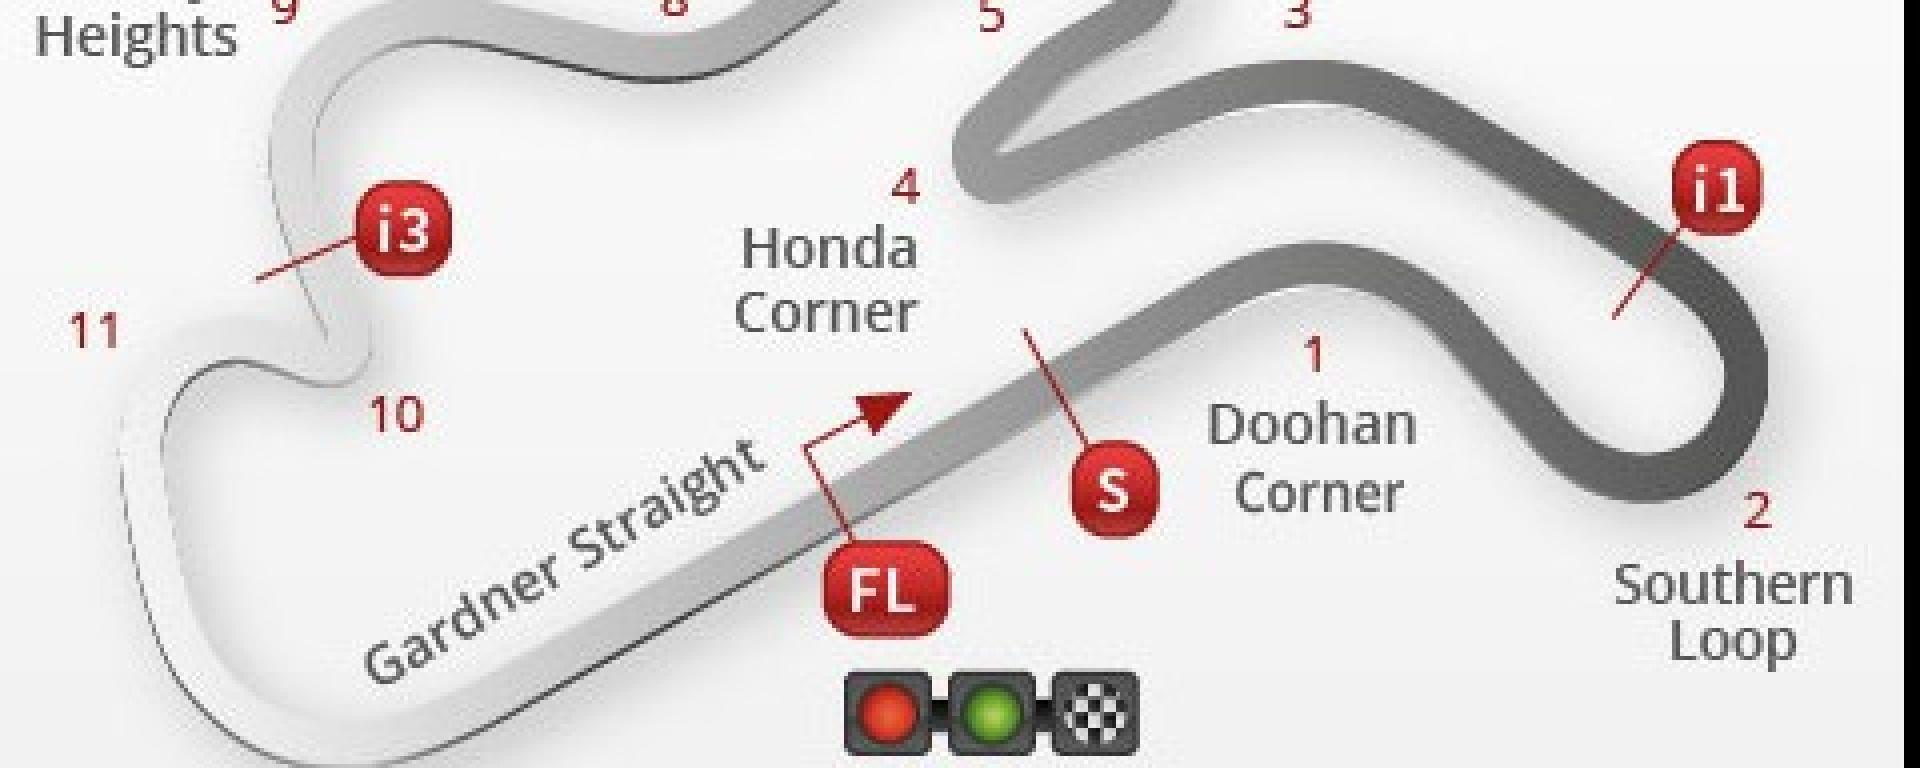 Gran Premio d'Australia Superbike: risultati Gara 1 e Gara 2